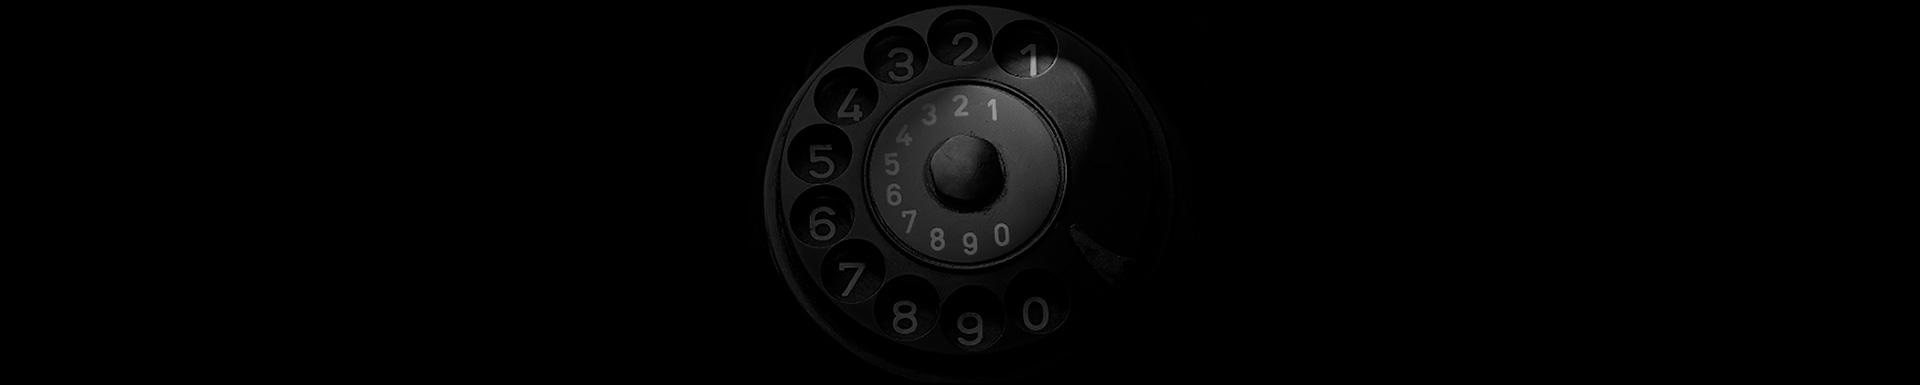 Contact-Phone-Full